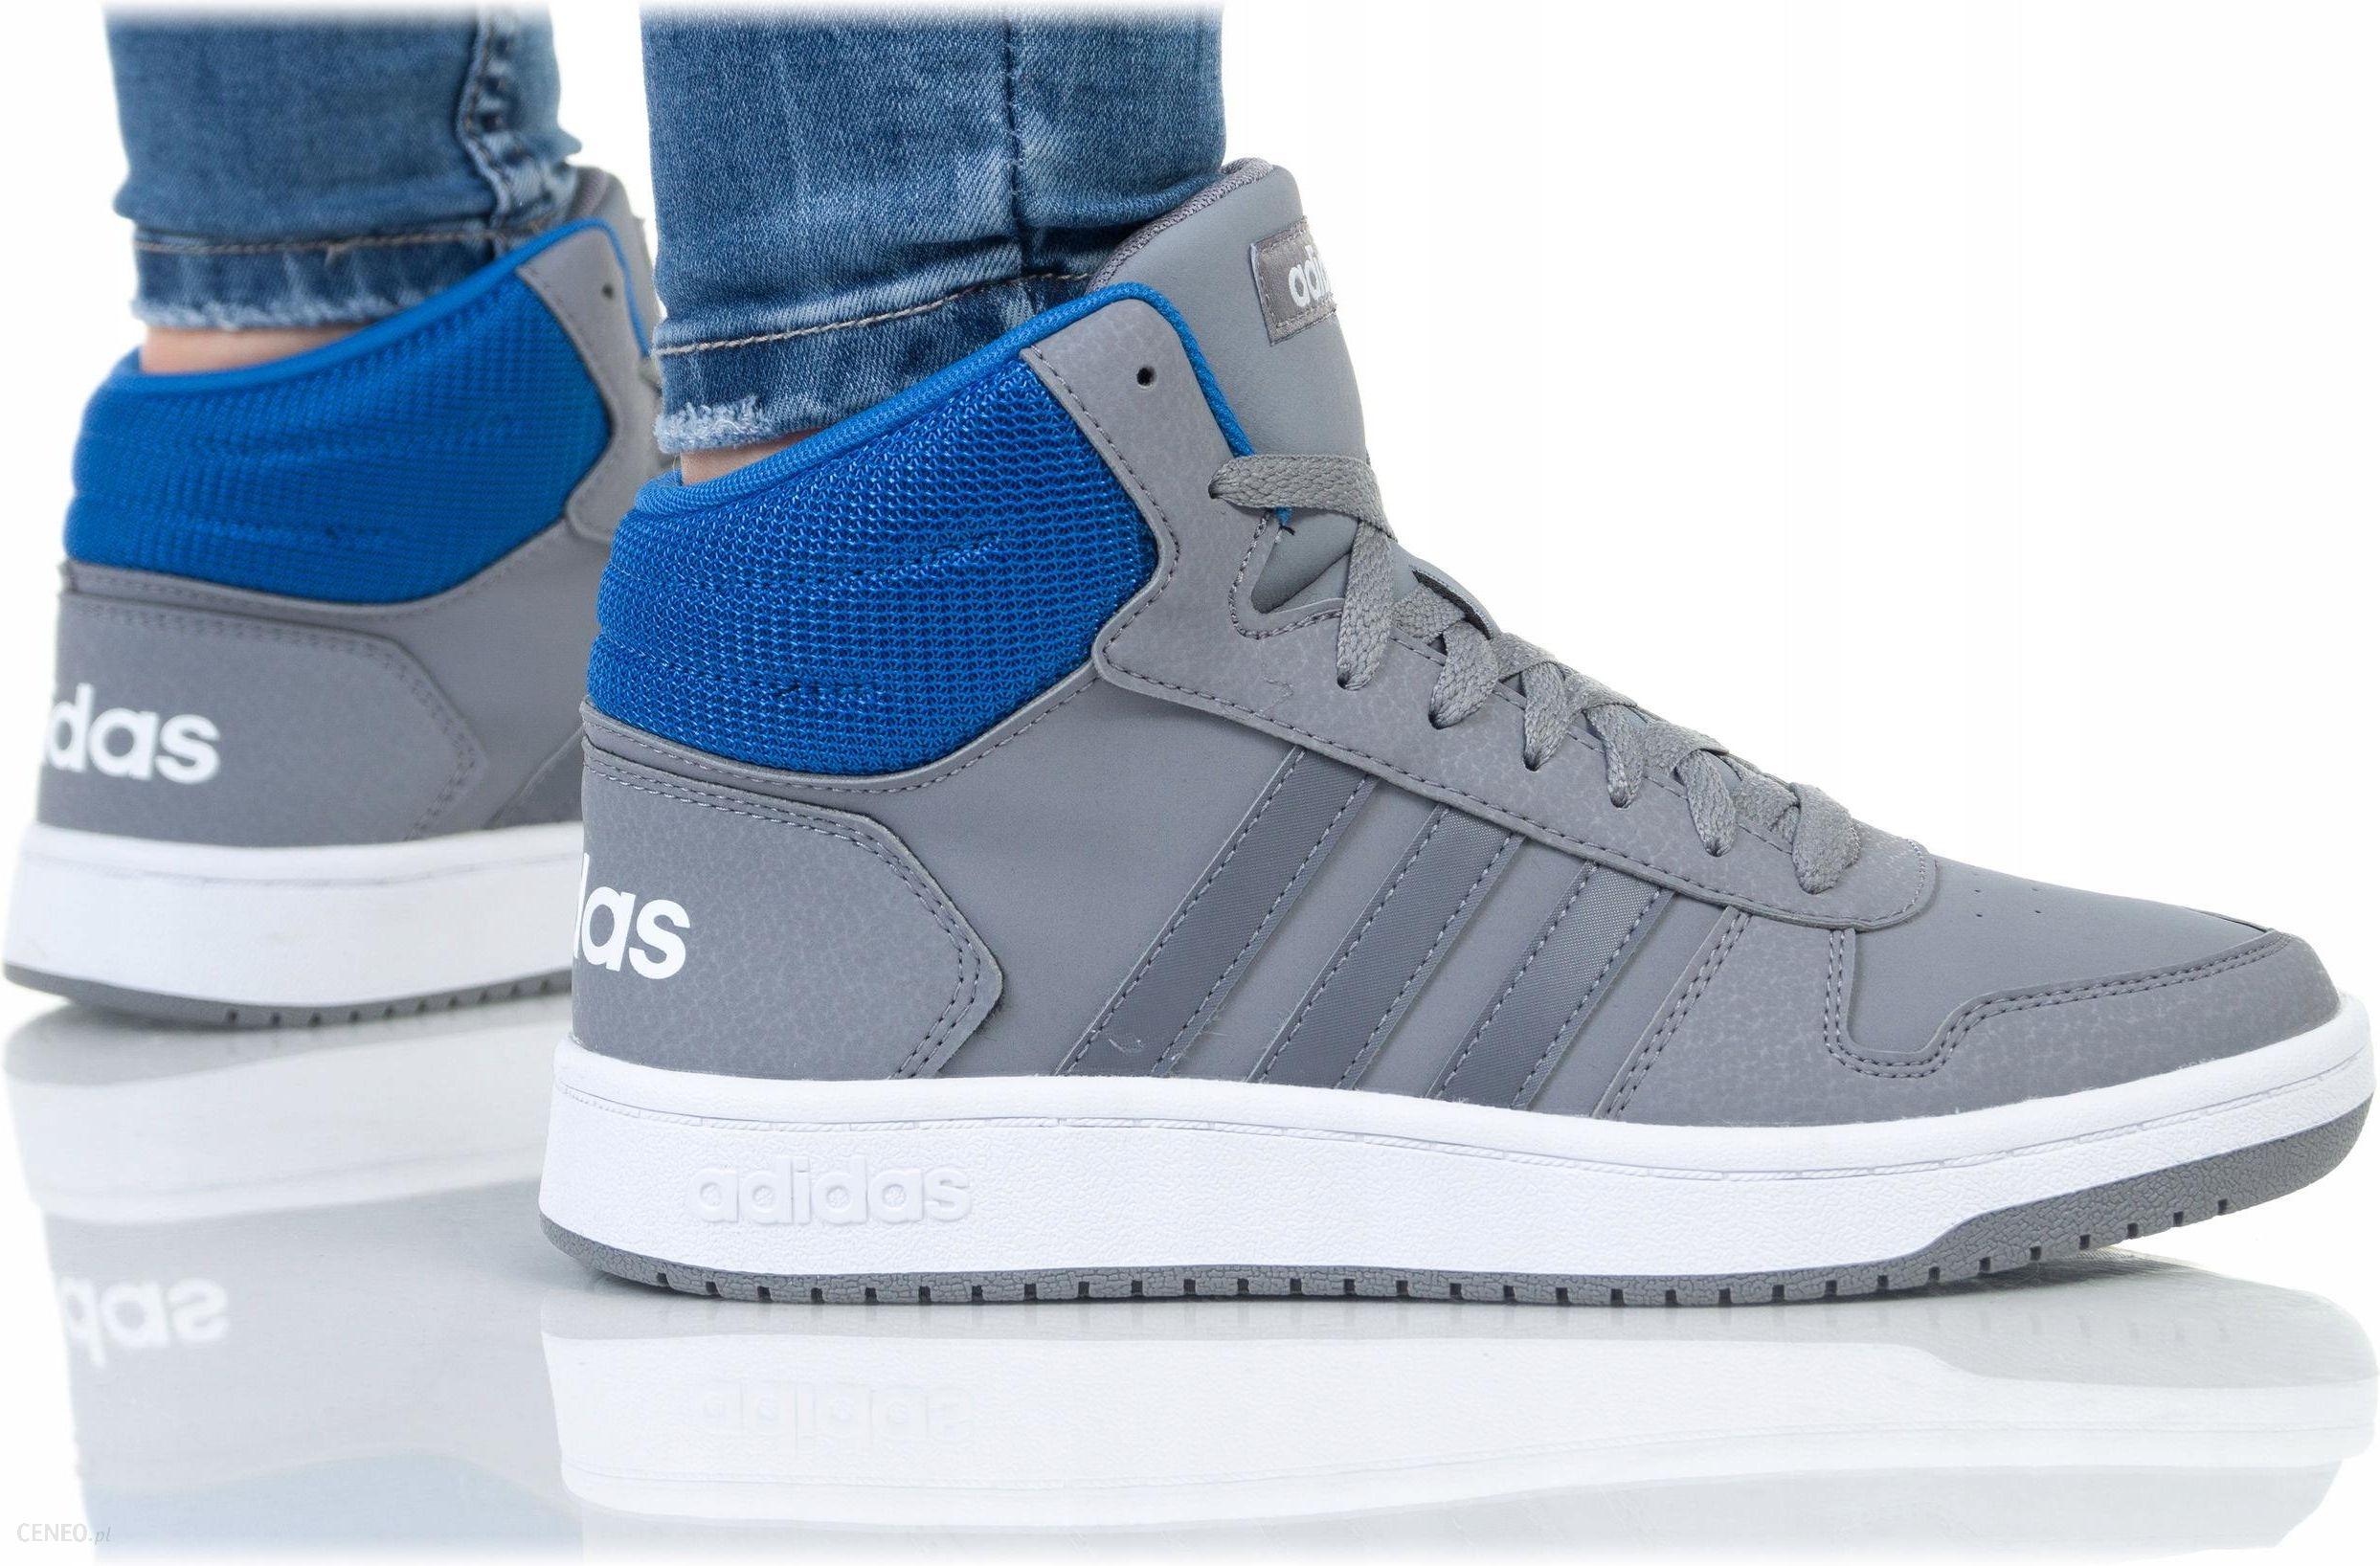 Buty Adidas Hoops MID 2.0 K F35100 Szare R. 37 13 Ceny i opinie Ceneo.pl